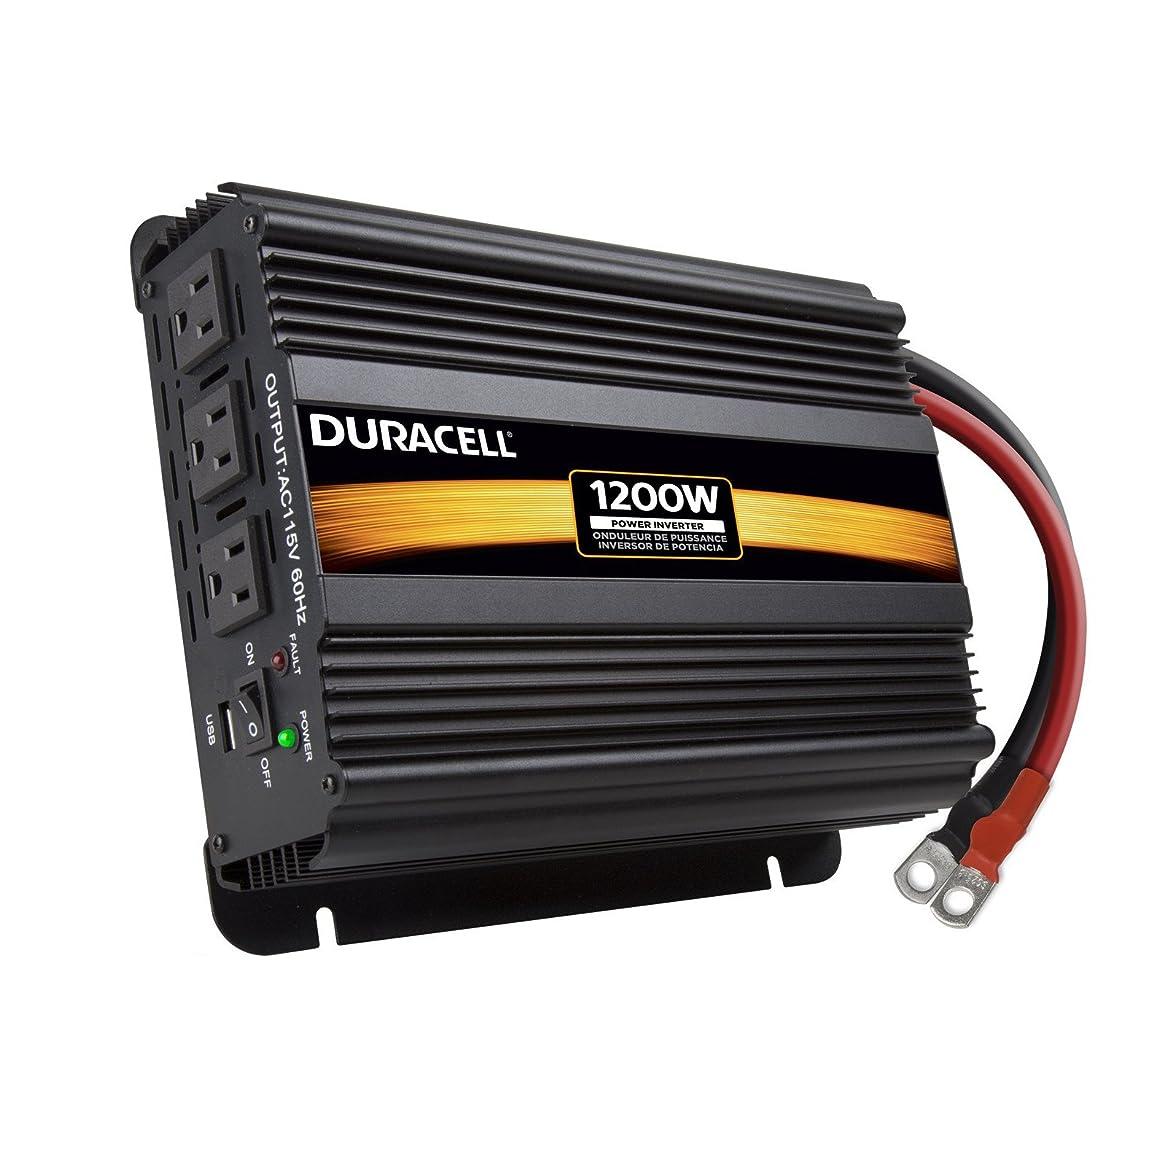 Duracell Power DRINV1200 Black High Power Inverter, 1200 W